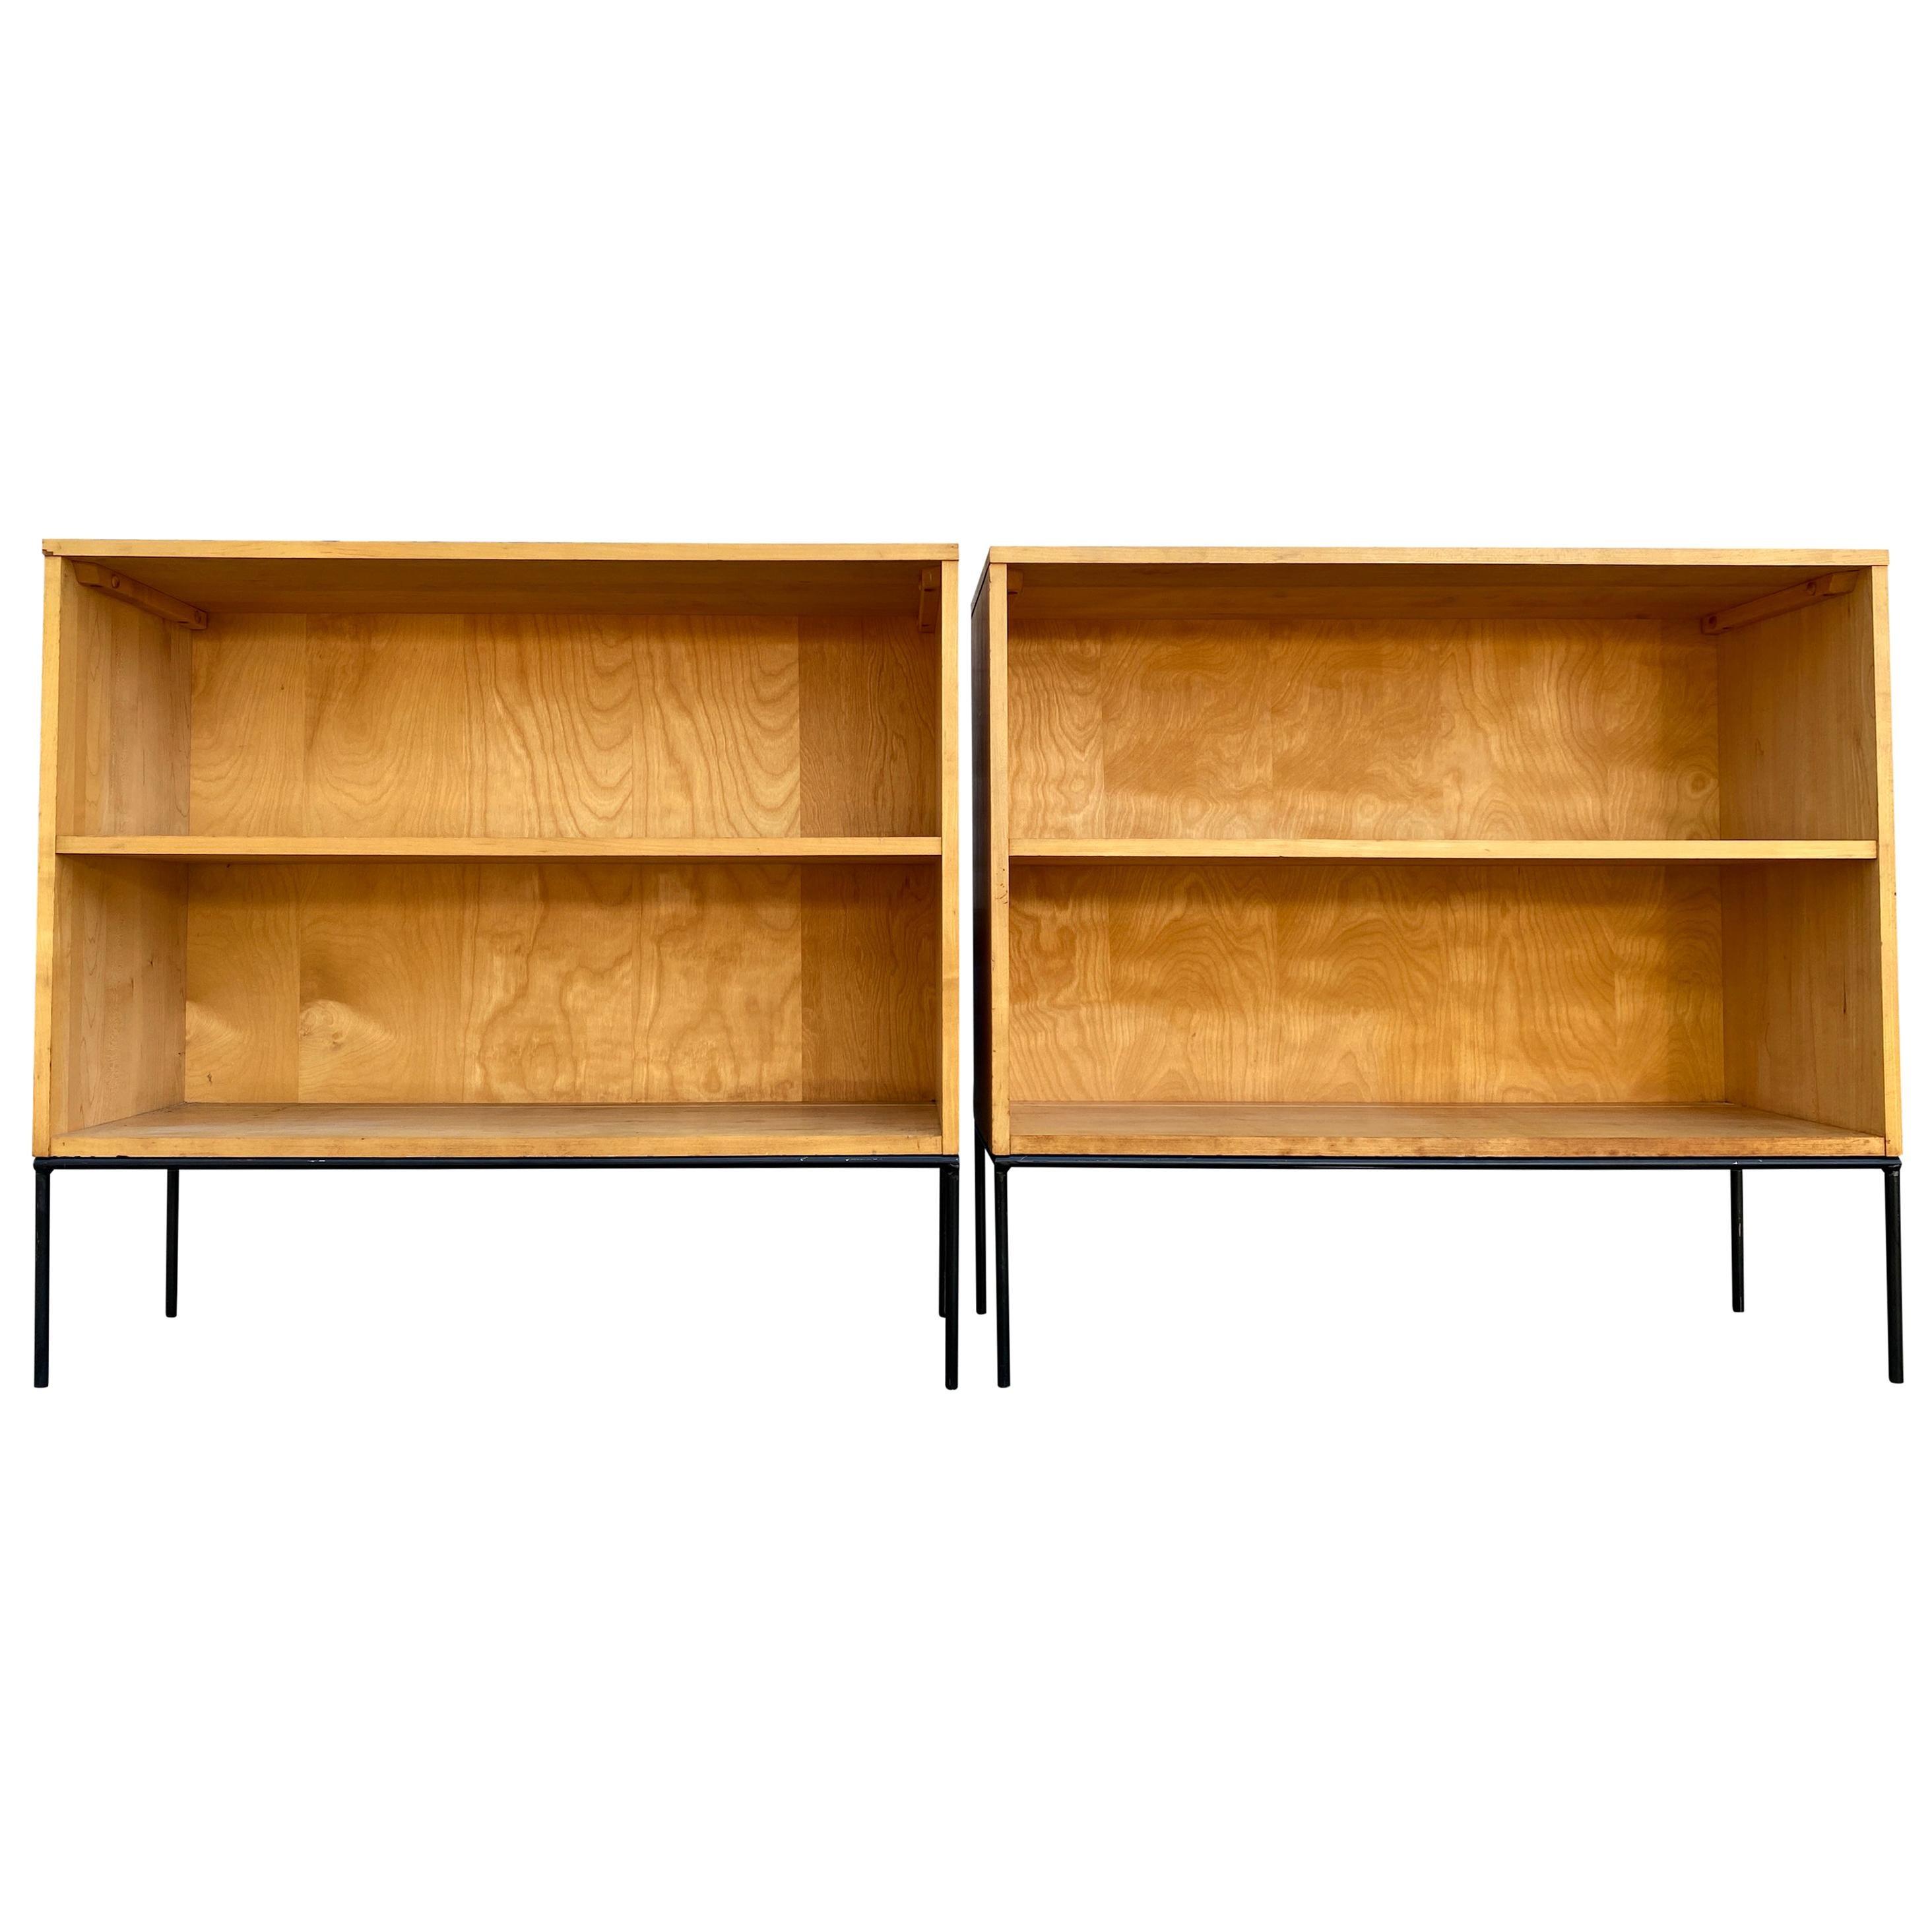 Pair of Midcentury Paul McCobb Single Bookcase #1516 Maple Iron Base Blonde